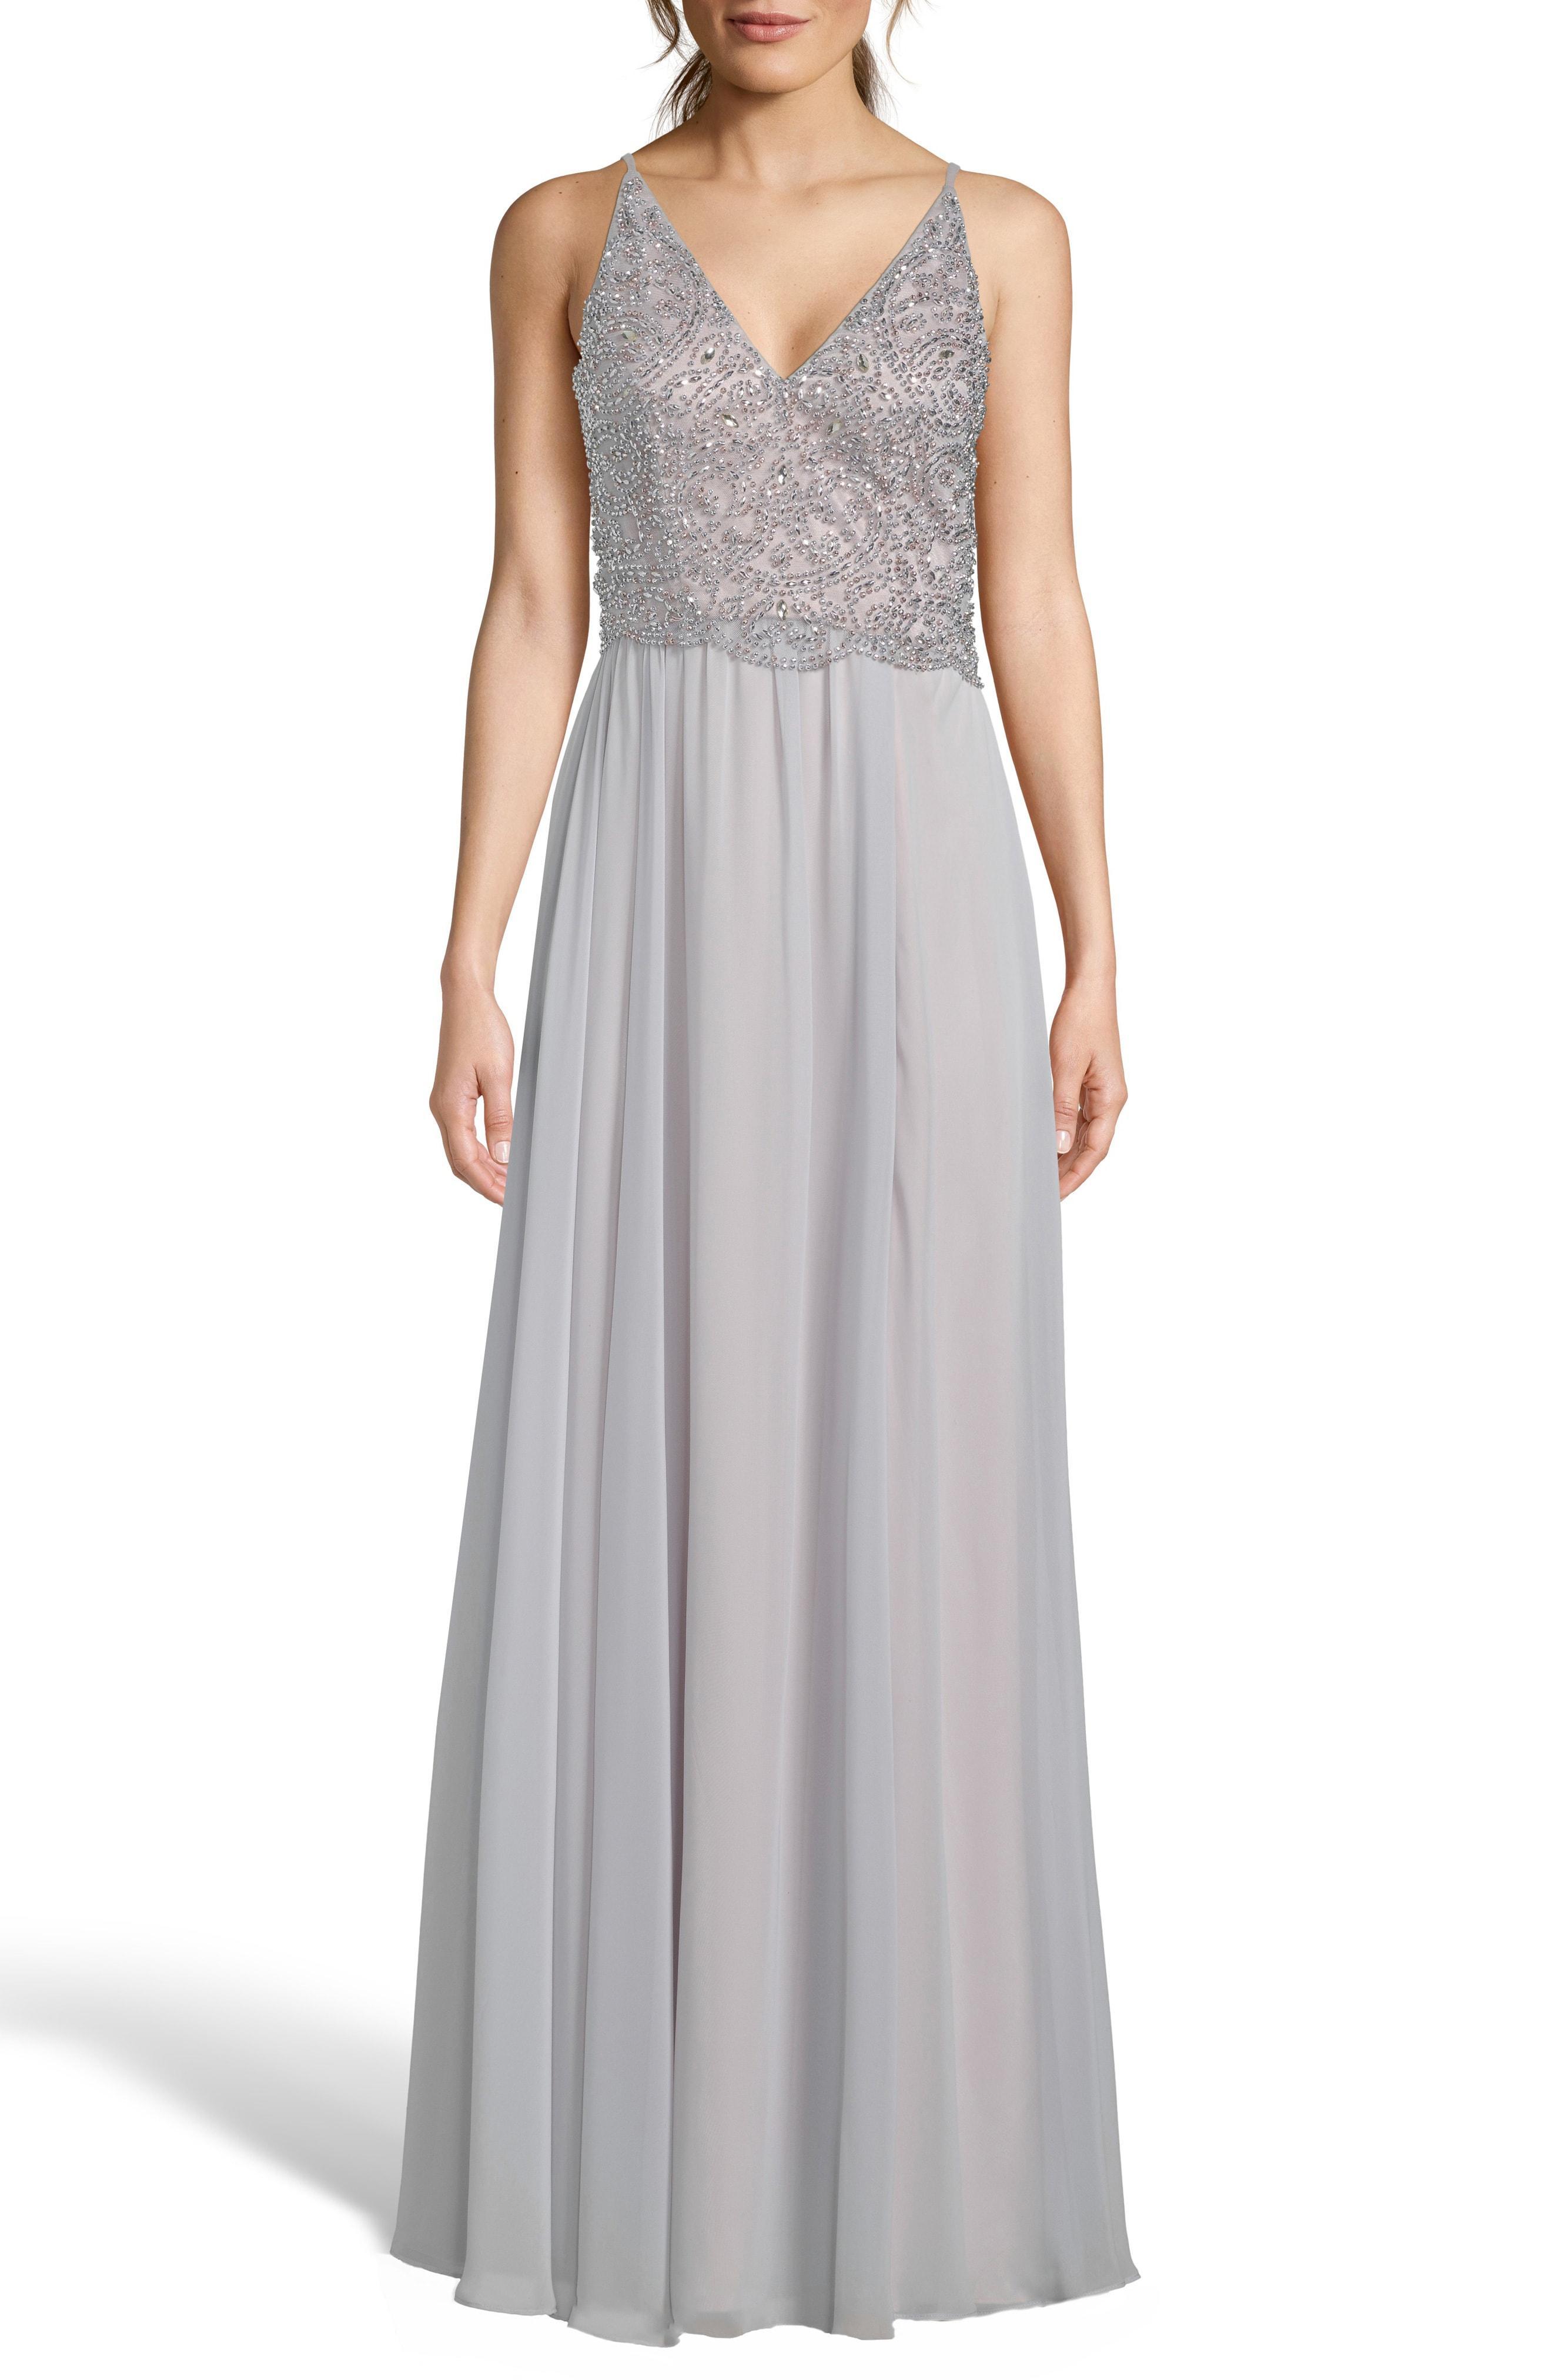 d1f8cd21 Lyst - Xscape Embellished Bodice V-neck Chiffon Evening Dress in Gray